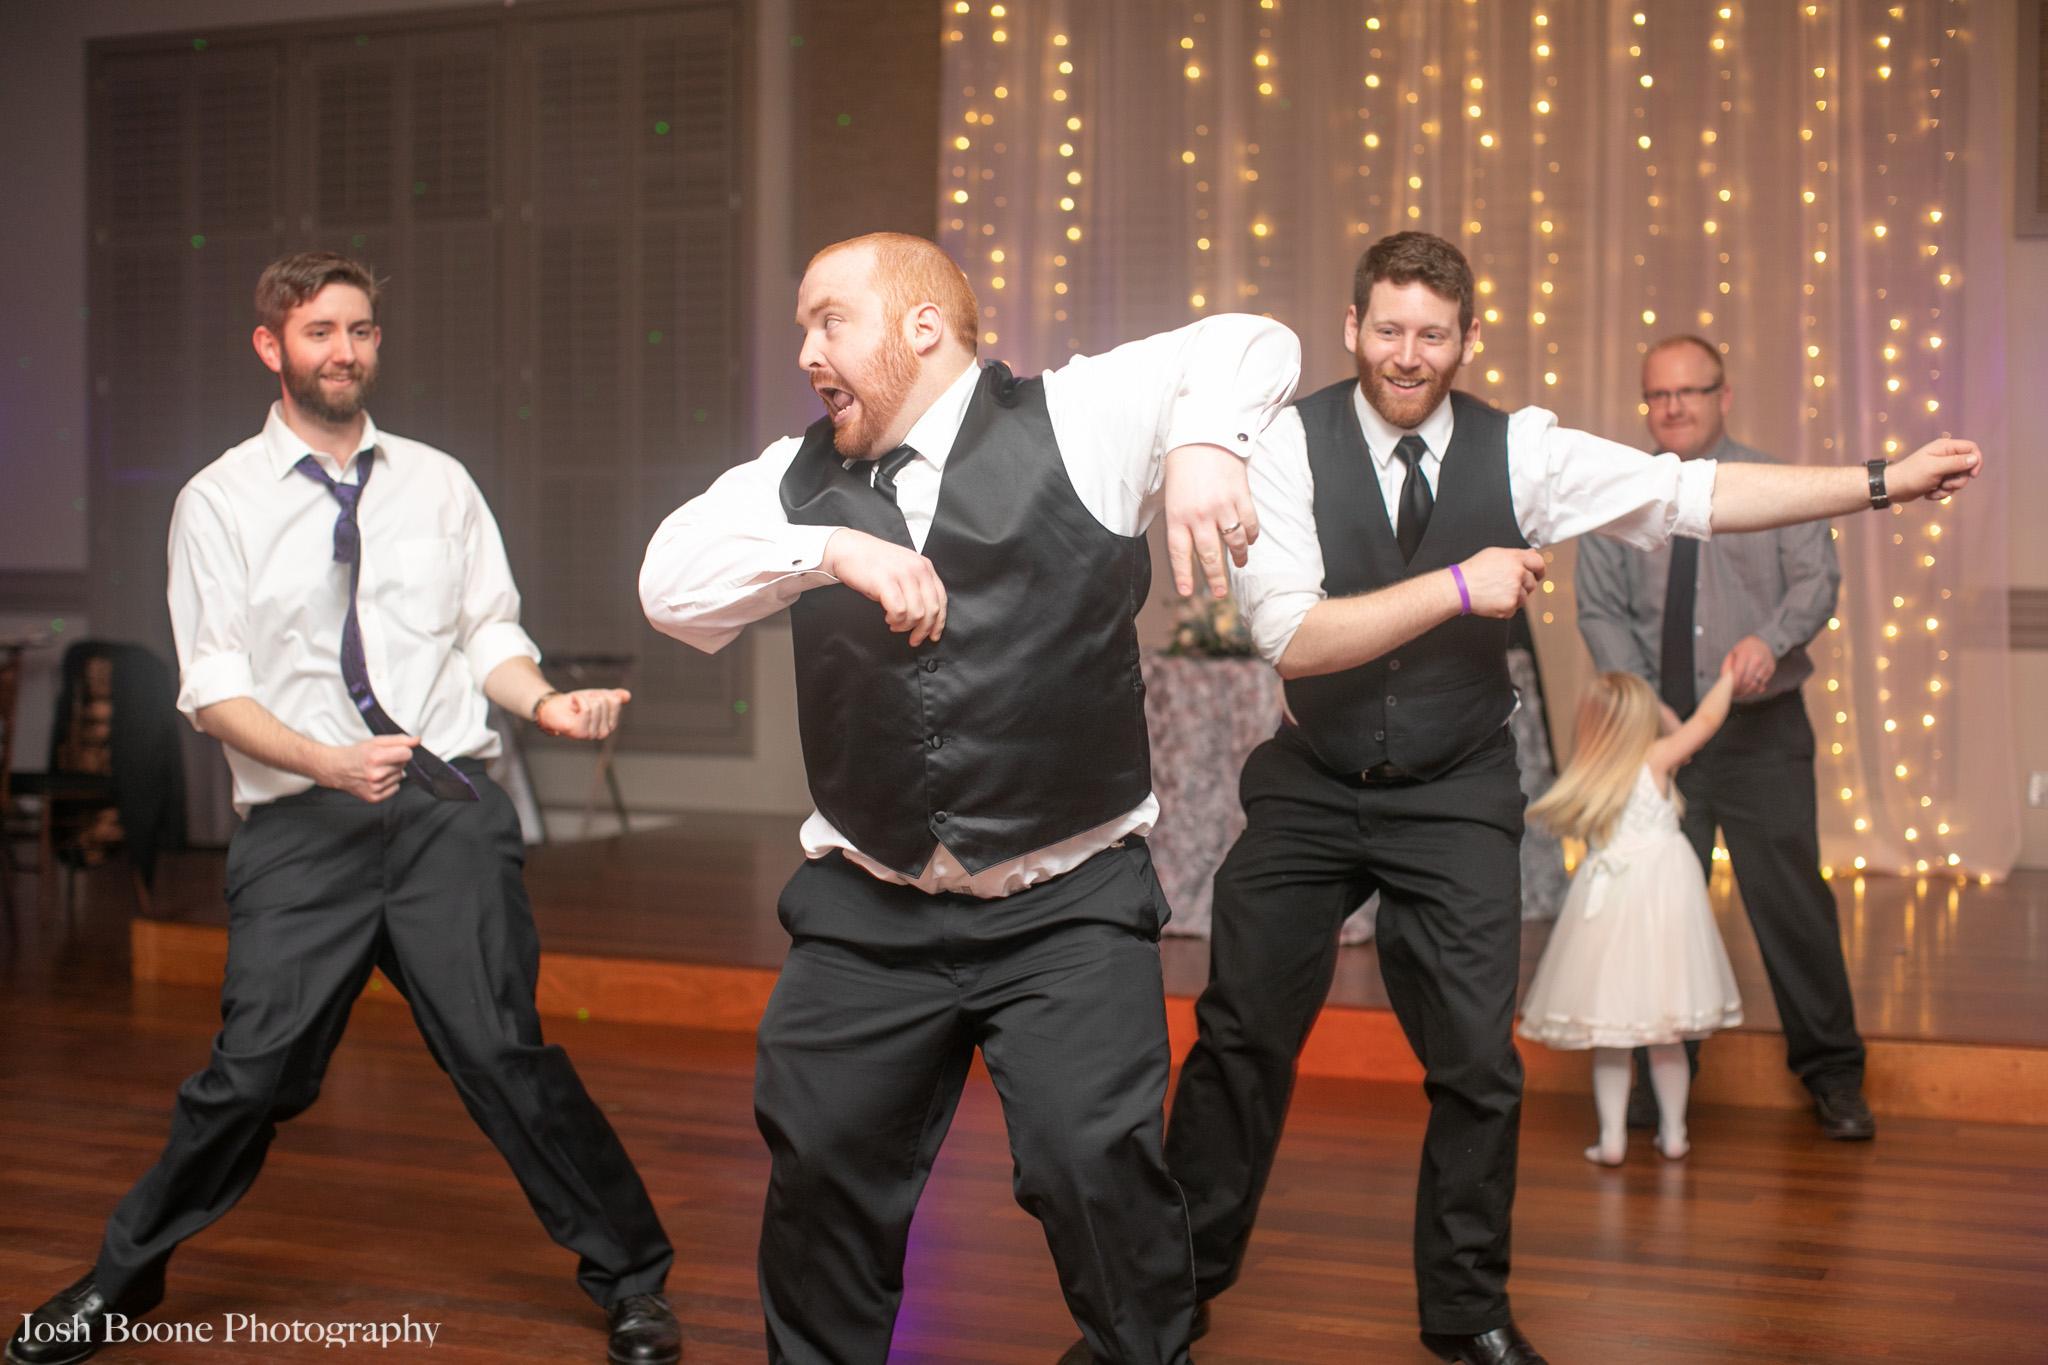 noahs_event_venue_wedding-104.jpg